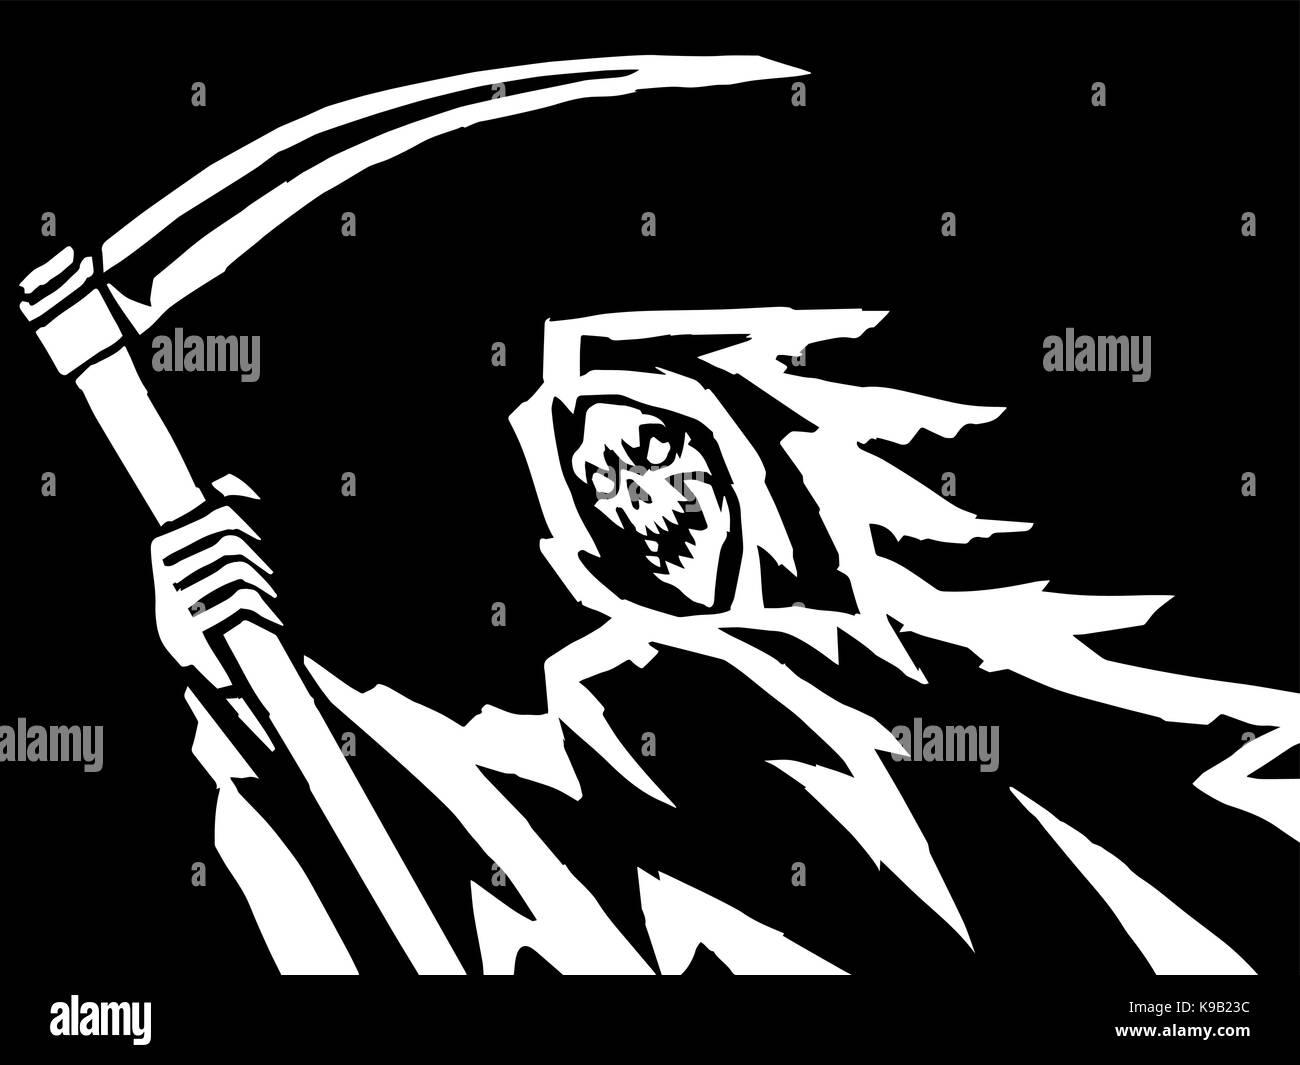 black death vector illustration spooky apocalypse demon spirit rock stock vector image art alamy https www alamy com stock image black death vector illustration spooky apocalypse demon spirit rock 160668352 html